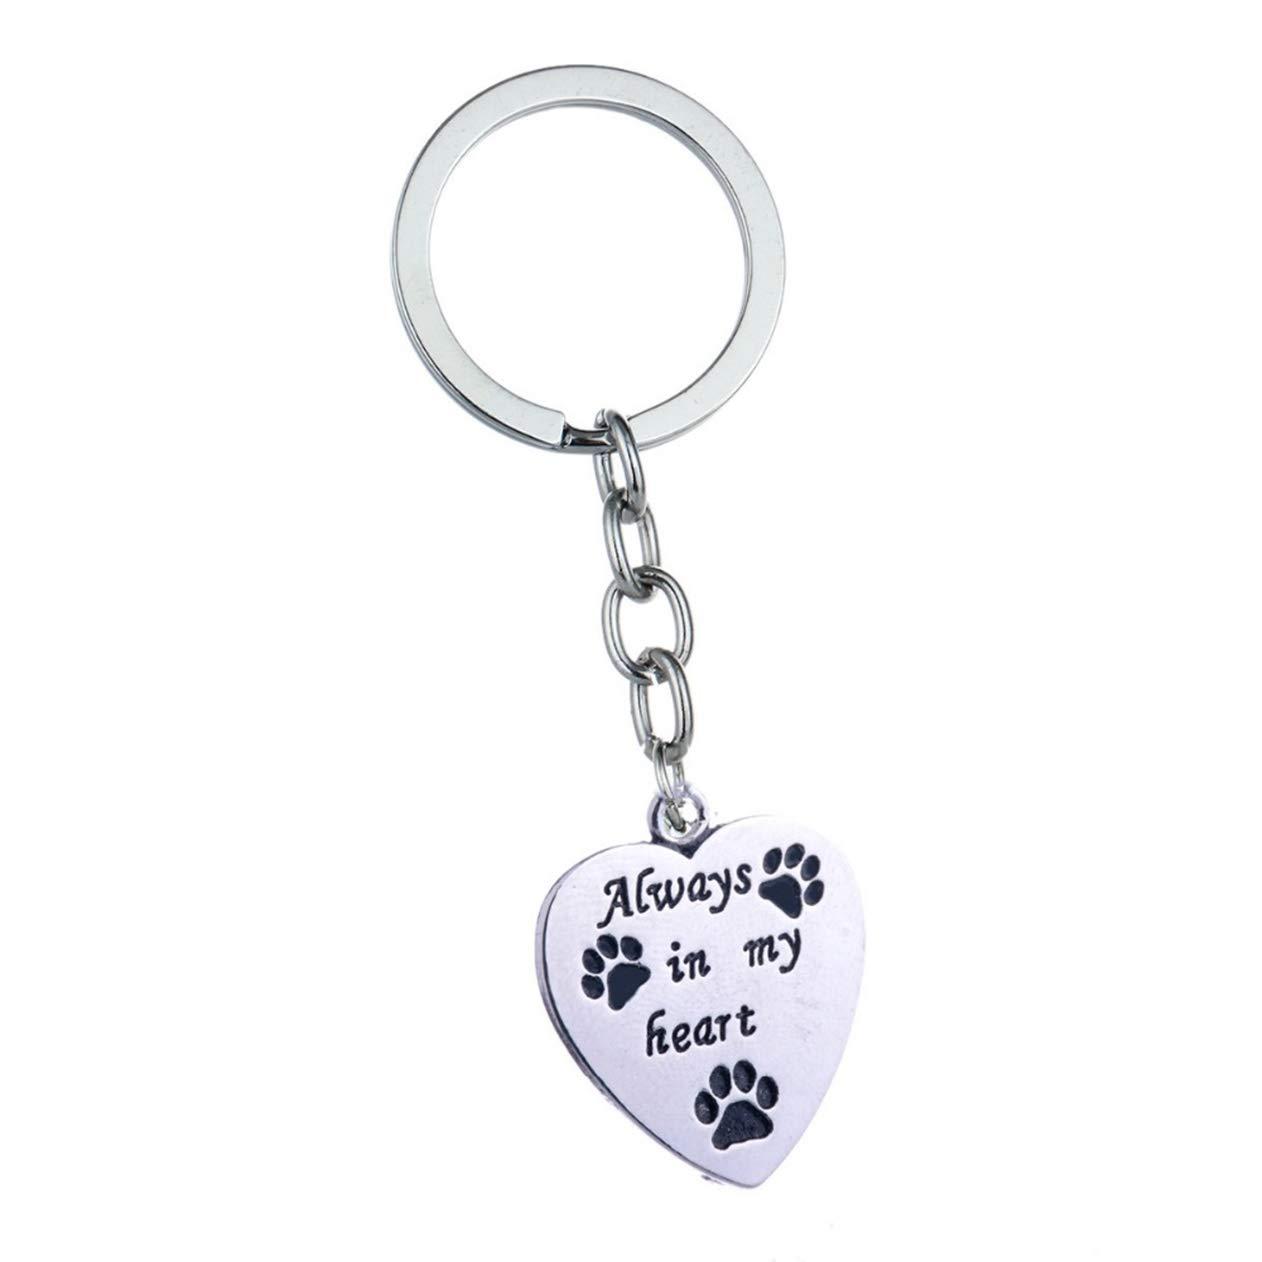 1 Pc Always in My Heart Love Dog Paws Print Keychains Pendant Teen Utility Tool Bottle Opener Key Rings Famed Popular Pocket Women Bag Car Keyring